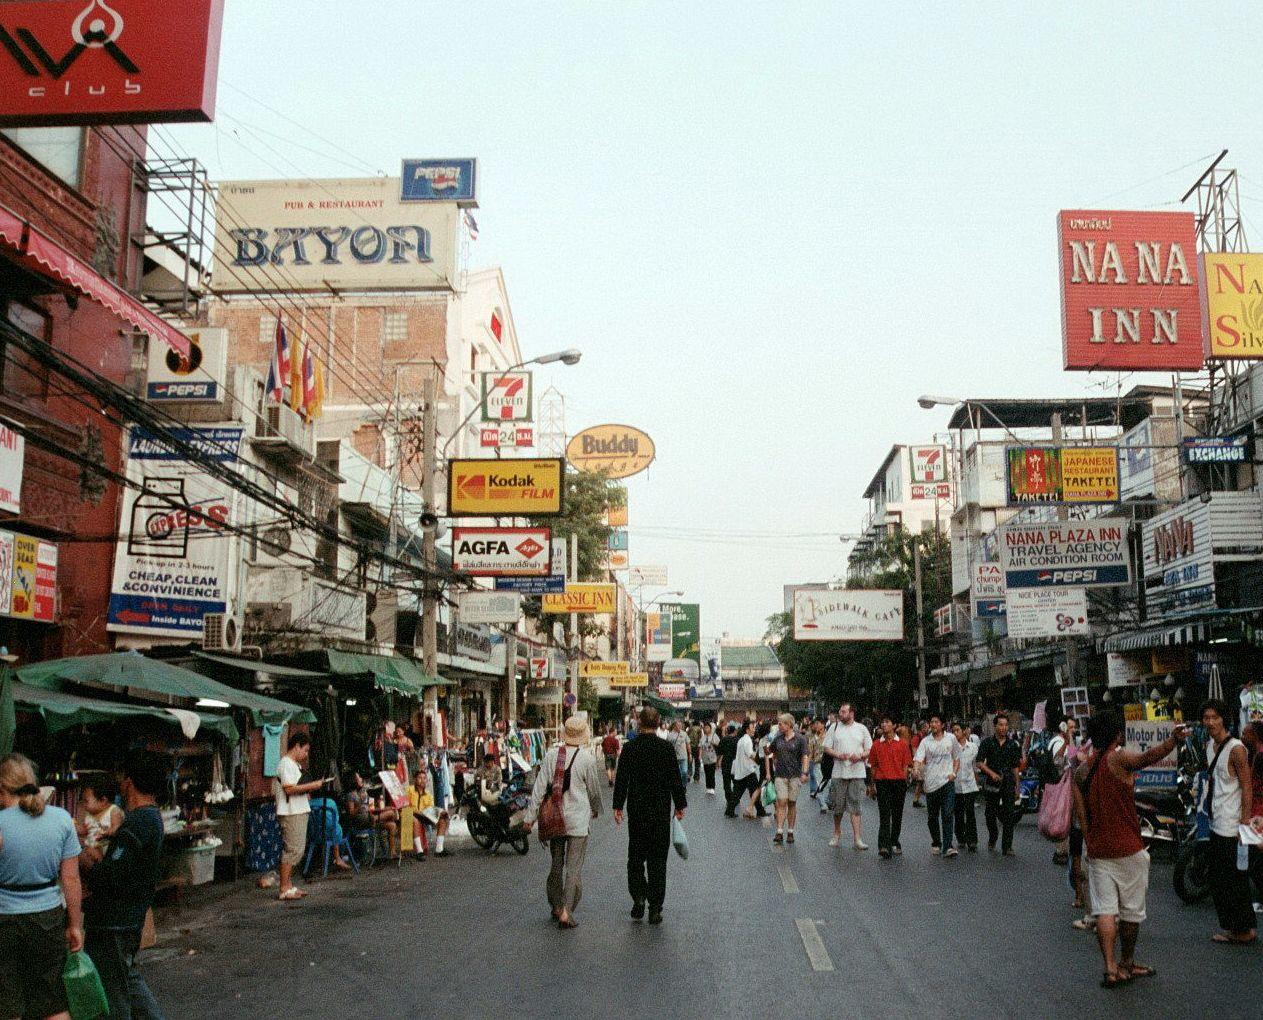 Khaosan_road_bangkok_thailand_mar_2003